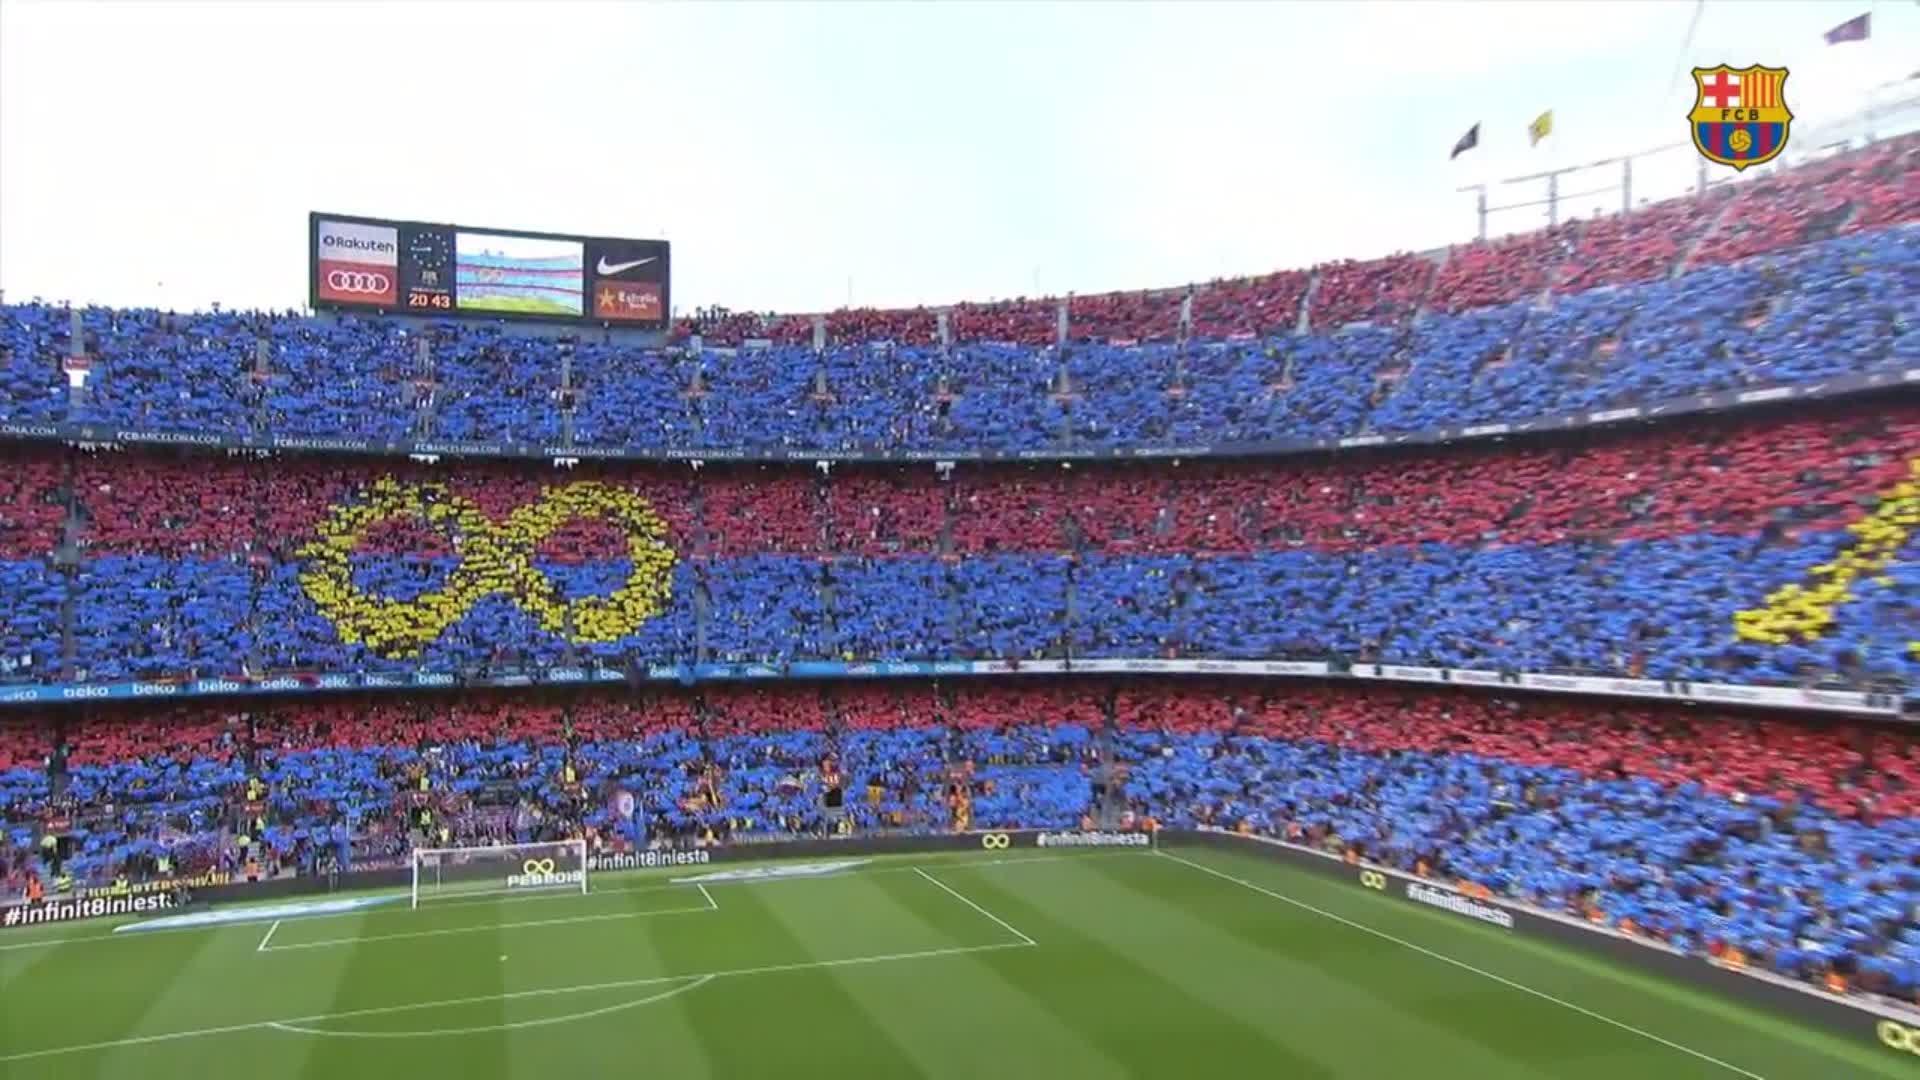 �� Camp Nou ���� ��❤  #infinit8iniesta https://t.co/axRTo8ZTit